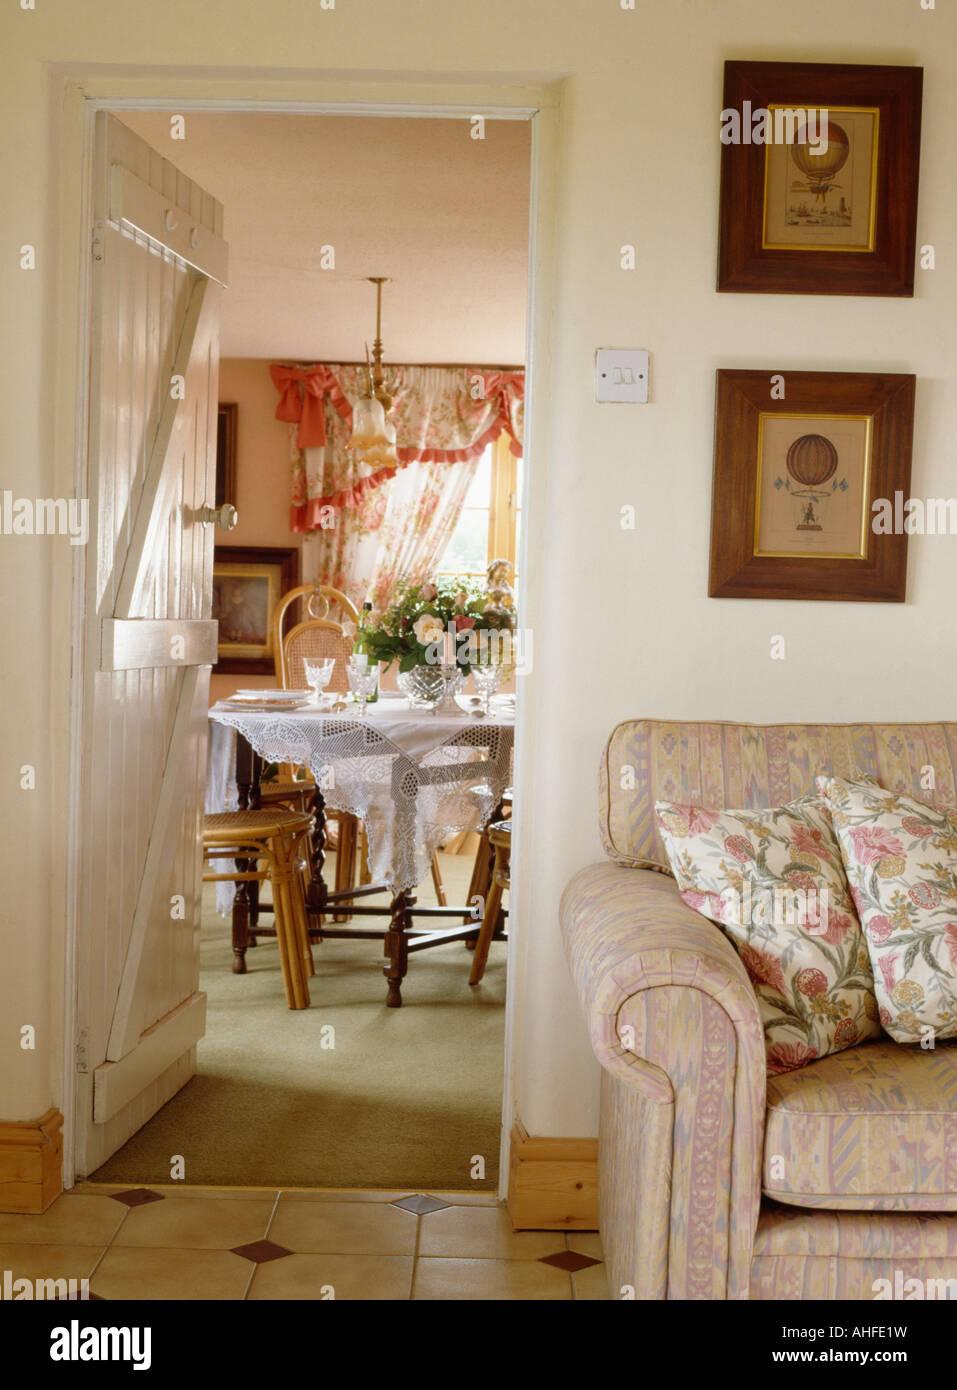 Cottage living room with door open to diningroom - Stock Image